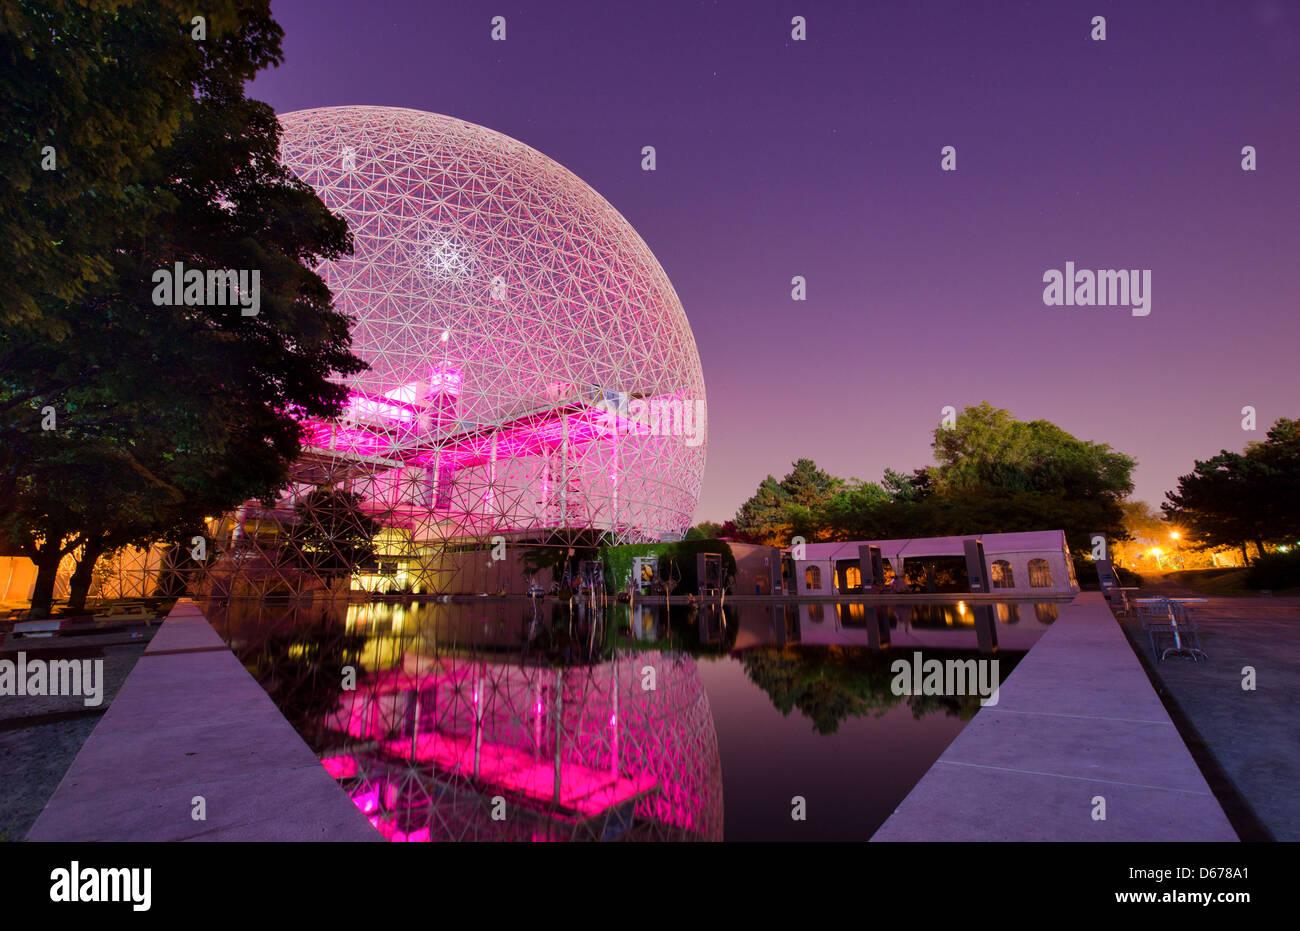 Montreal Biosphere by night on Jean Drapeau Island - Stock Image